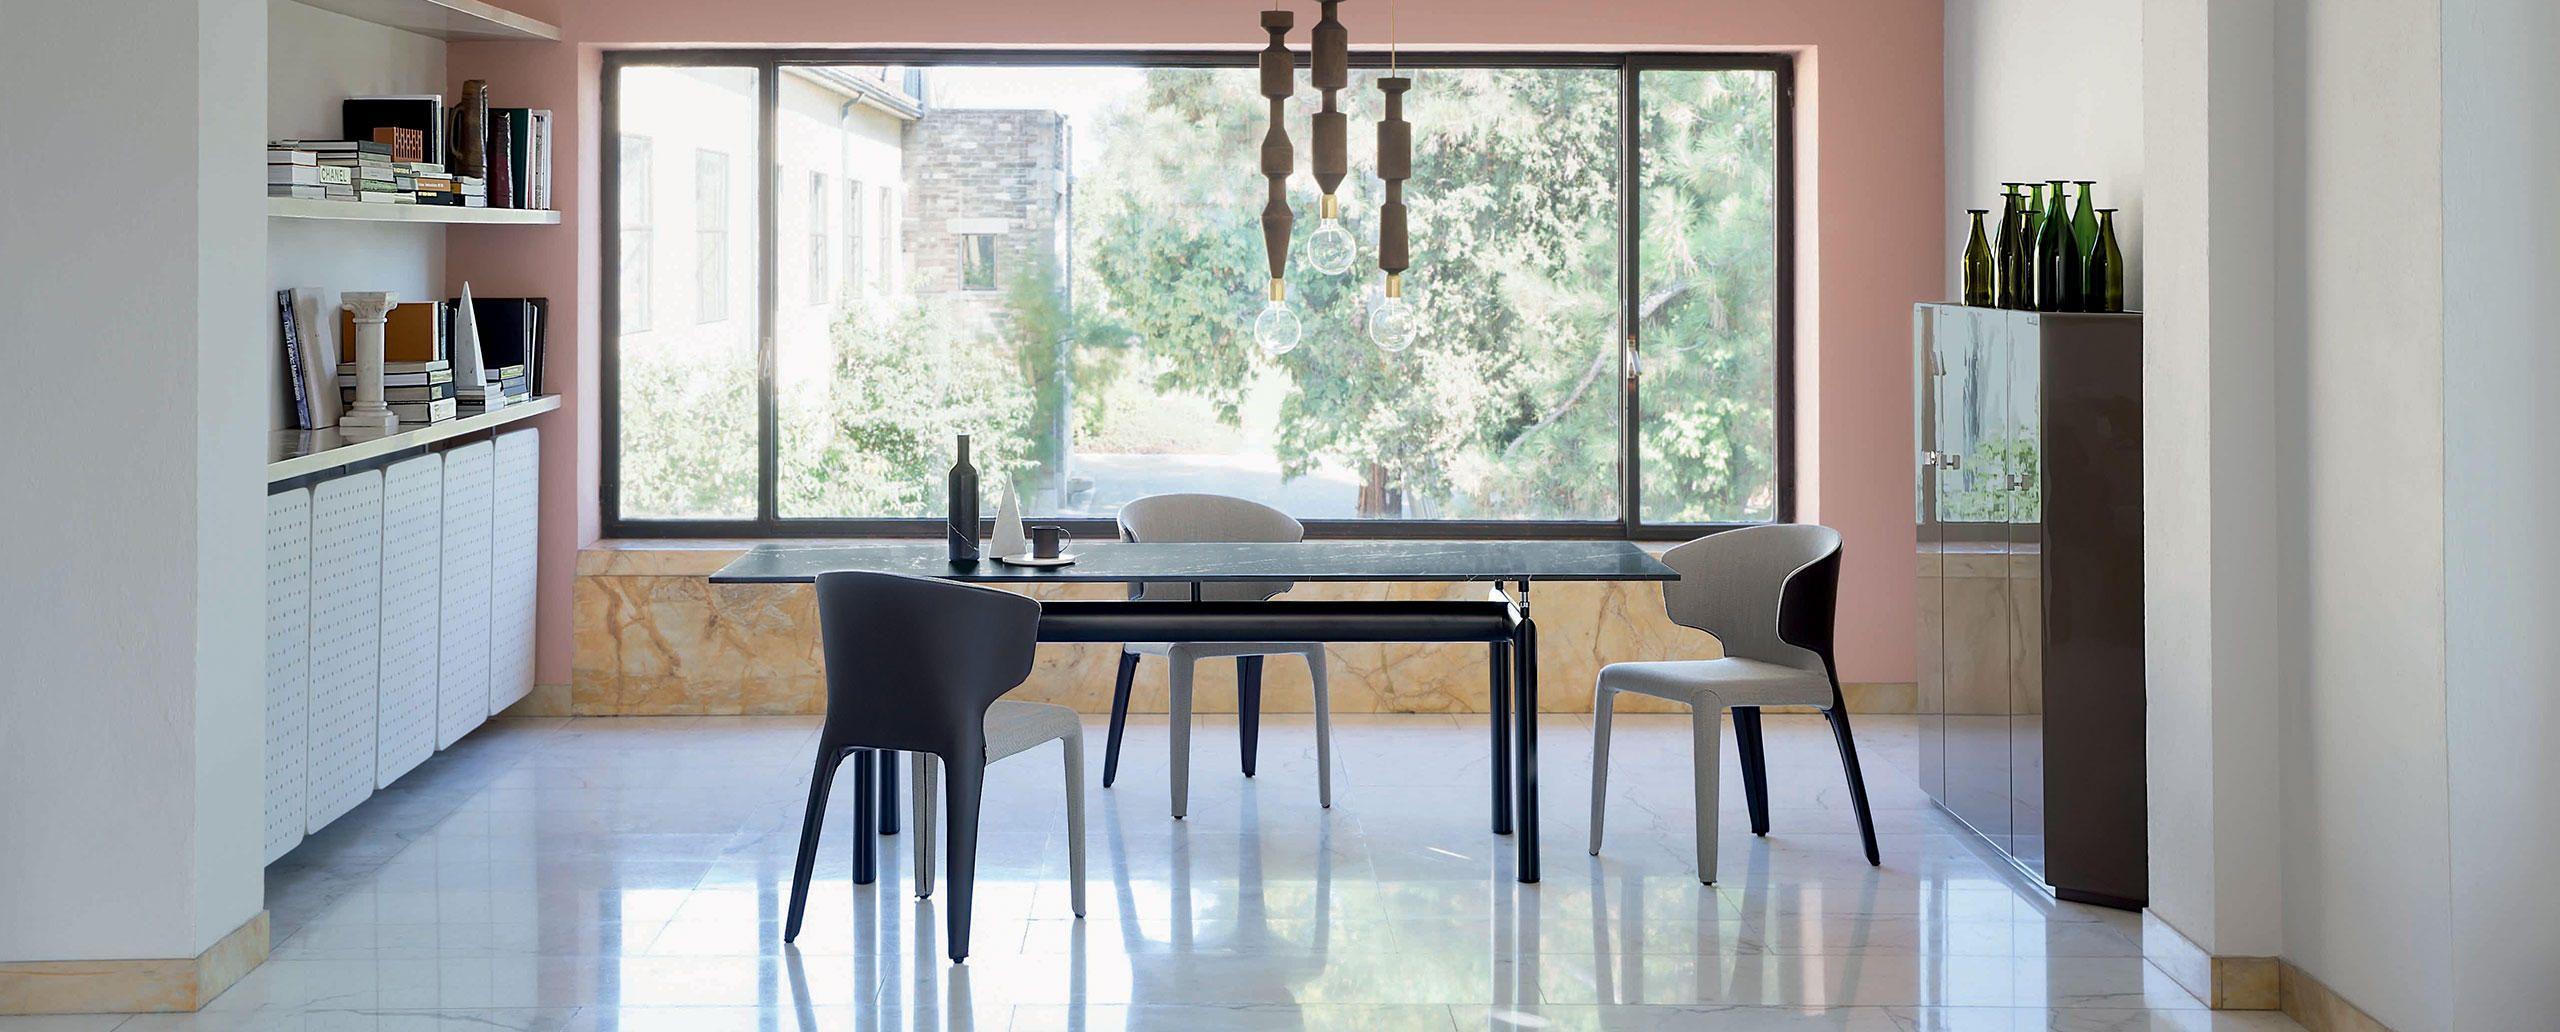 42120fee1b42925a3827e7b33f17b6d7 Incroyable De Table Basse Le Corbusier Concept